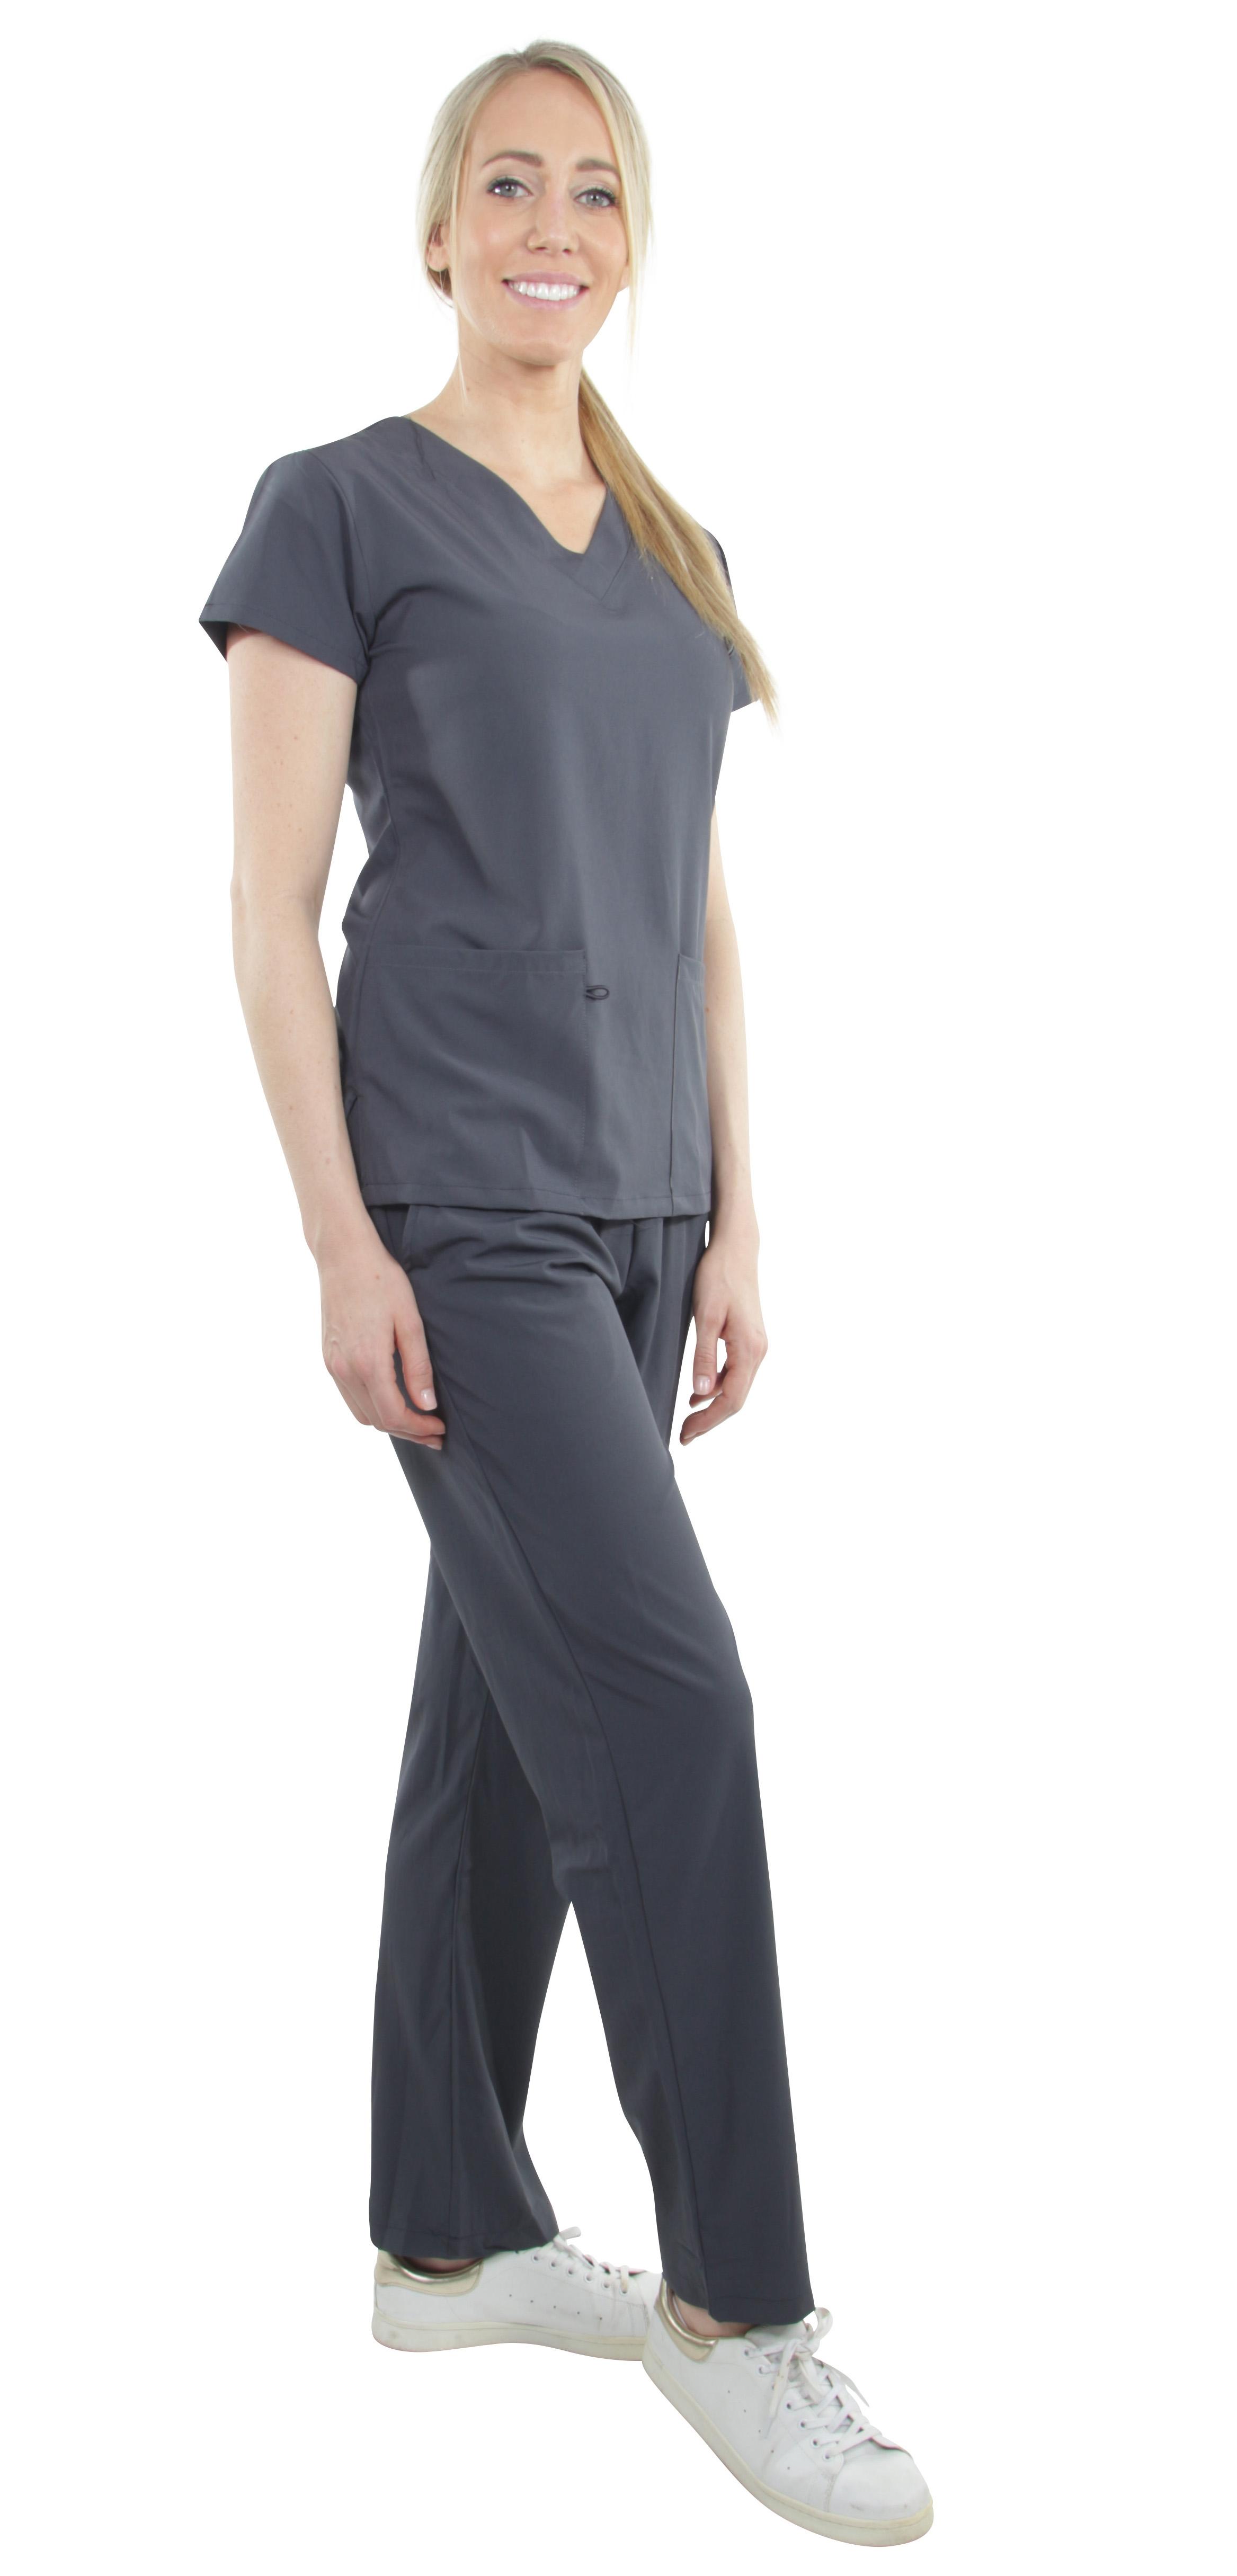 Unisex-Performance-Stretch-Medical-Uniform-Five-Pockets-V-Neck-Scrubs-Sets miniature 44